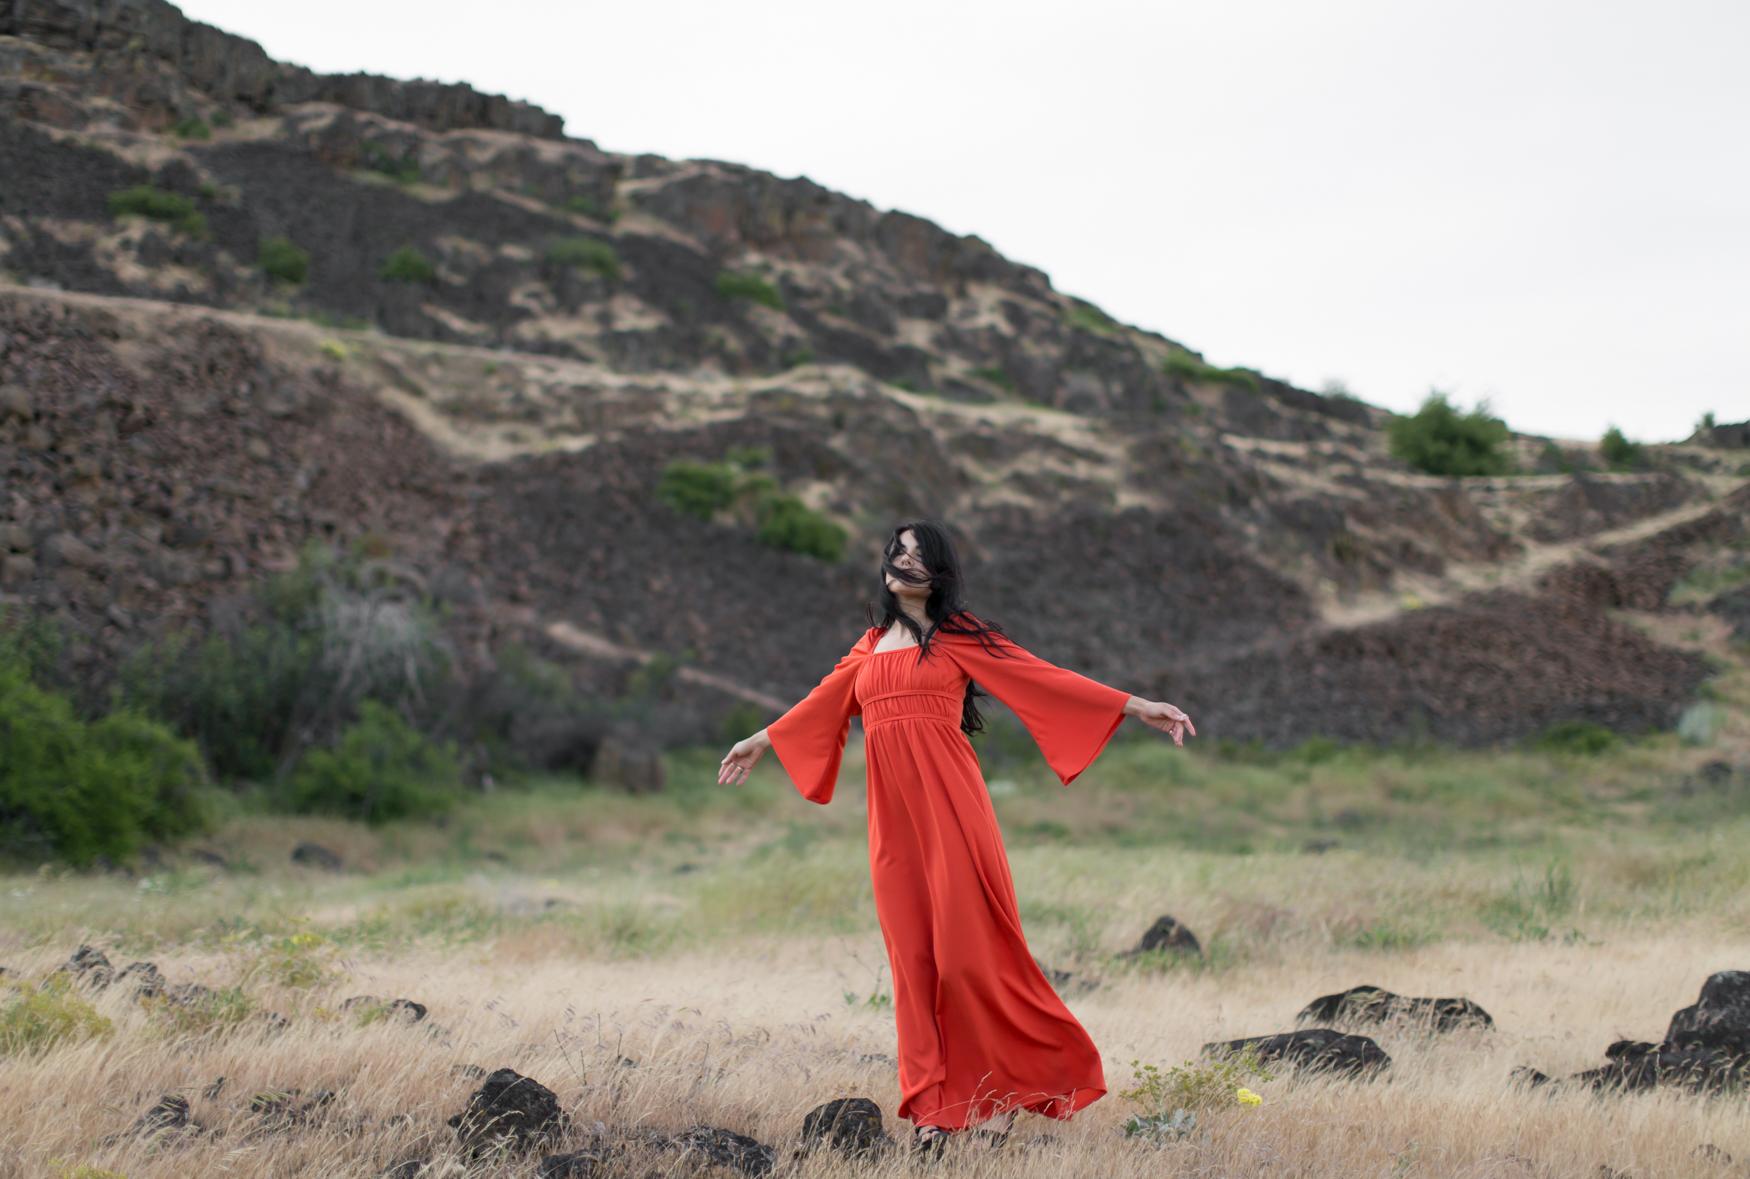 Olivia_Ashton_Photography-1-6.jpg